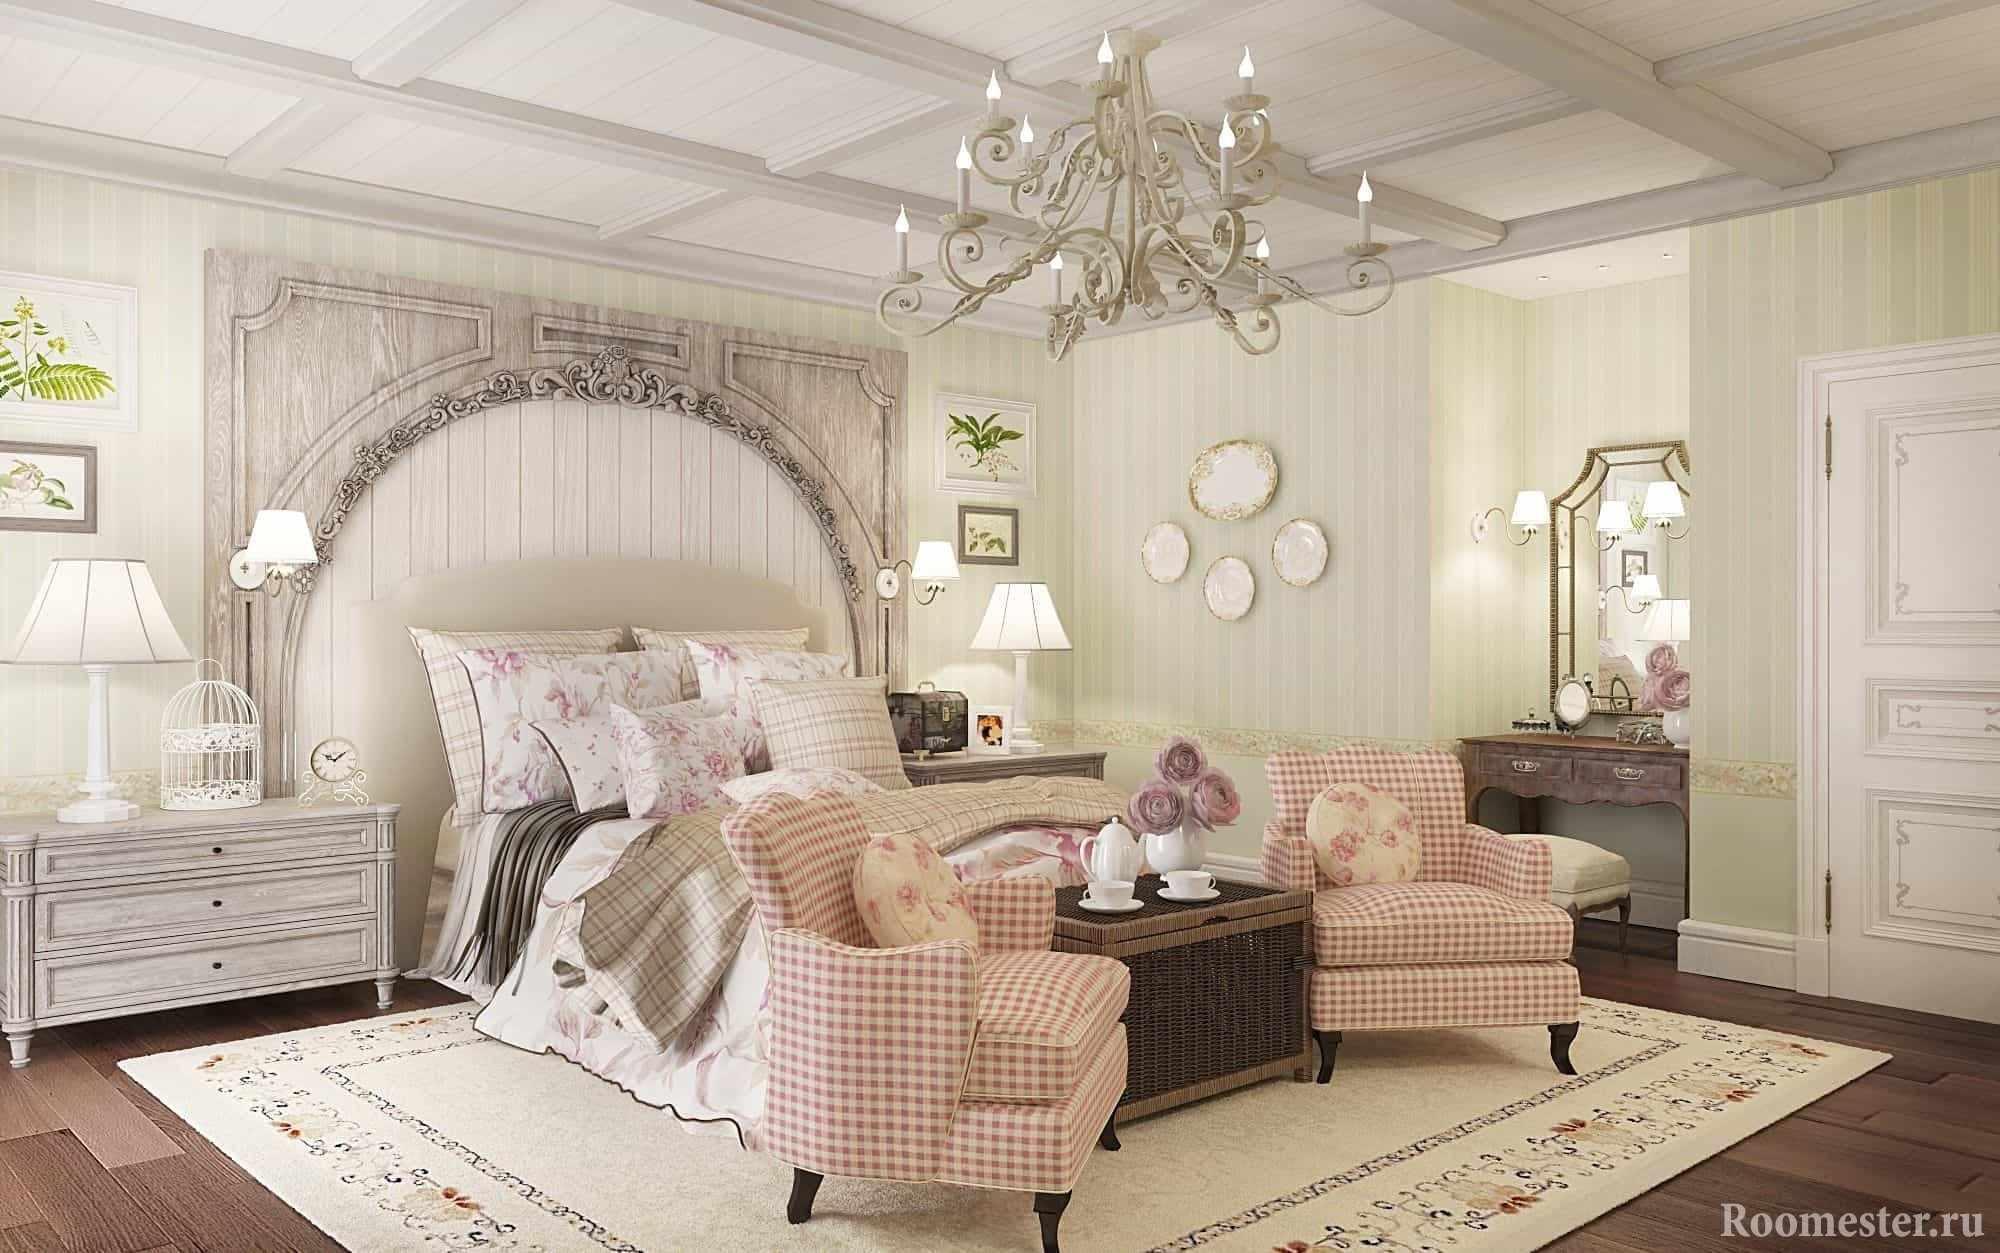 Романтичная спальня в стиле прованс